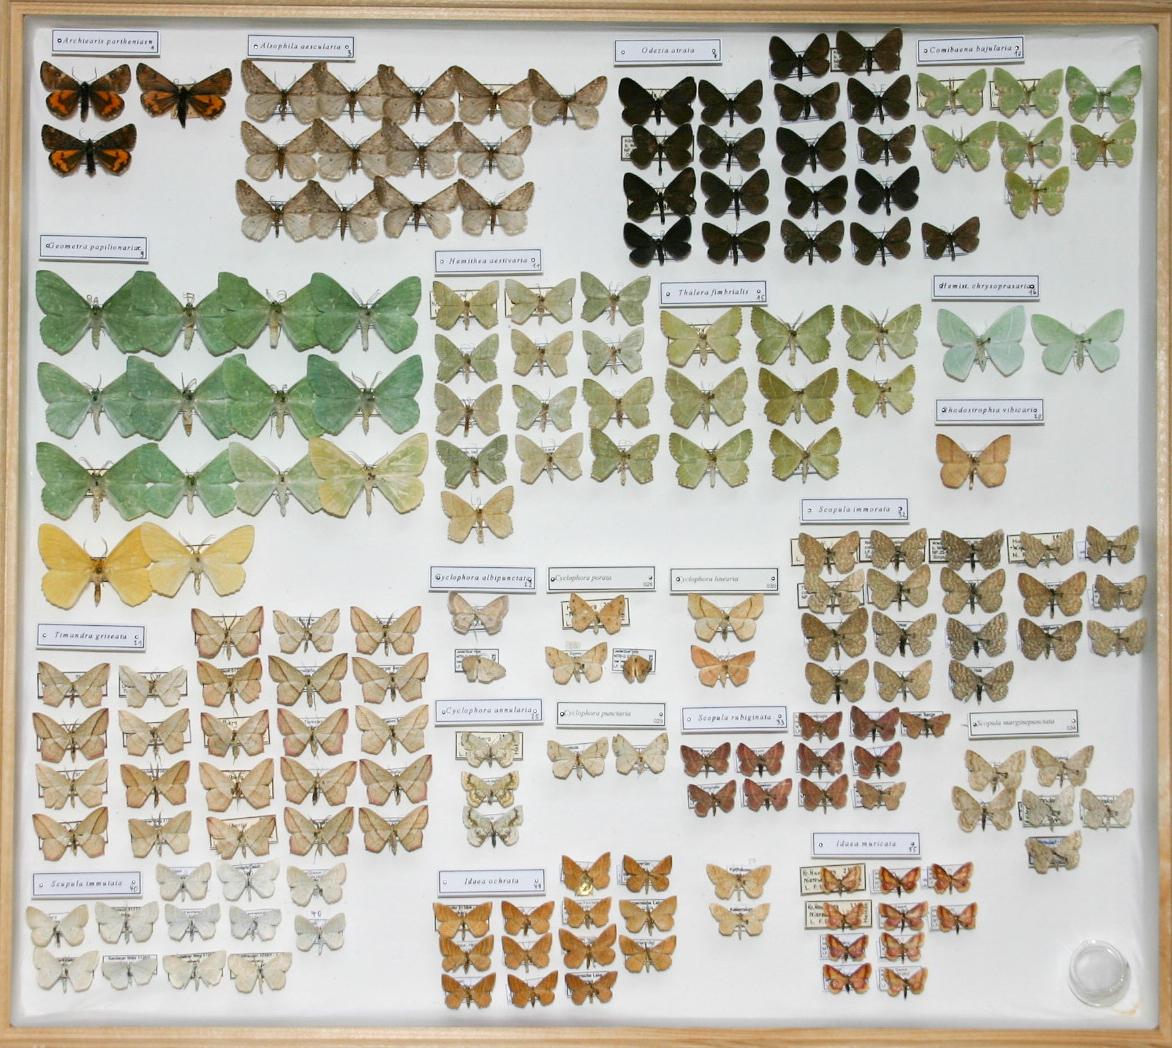 Schmetterlingssammlung Bernd Heinze, Havelberg